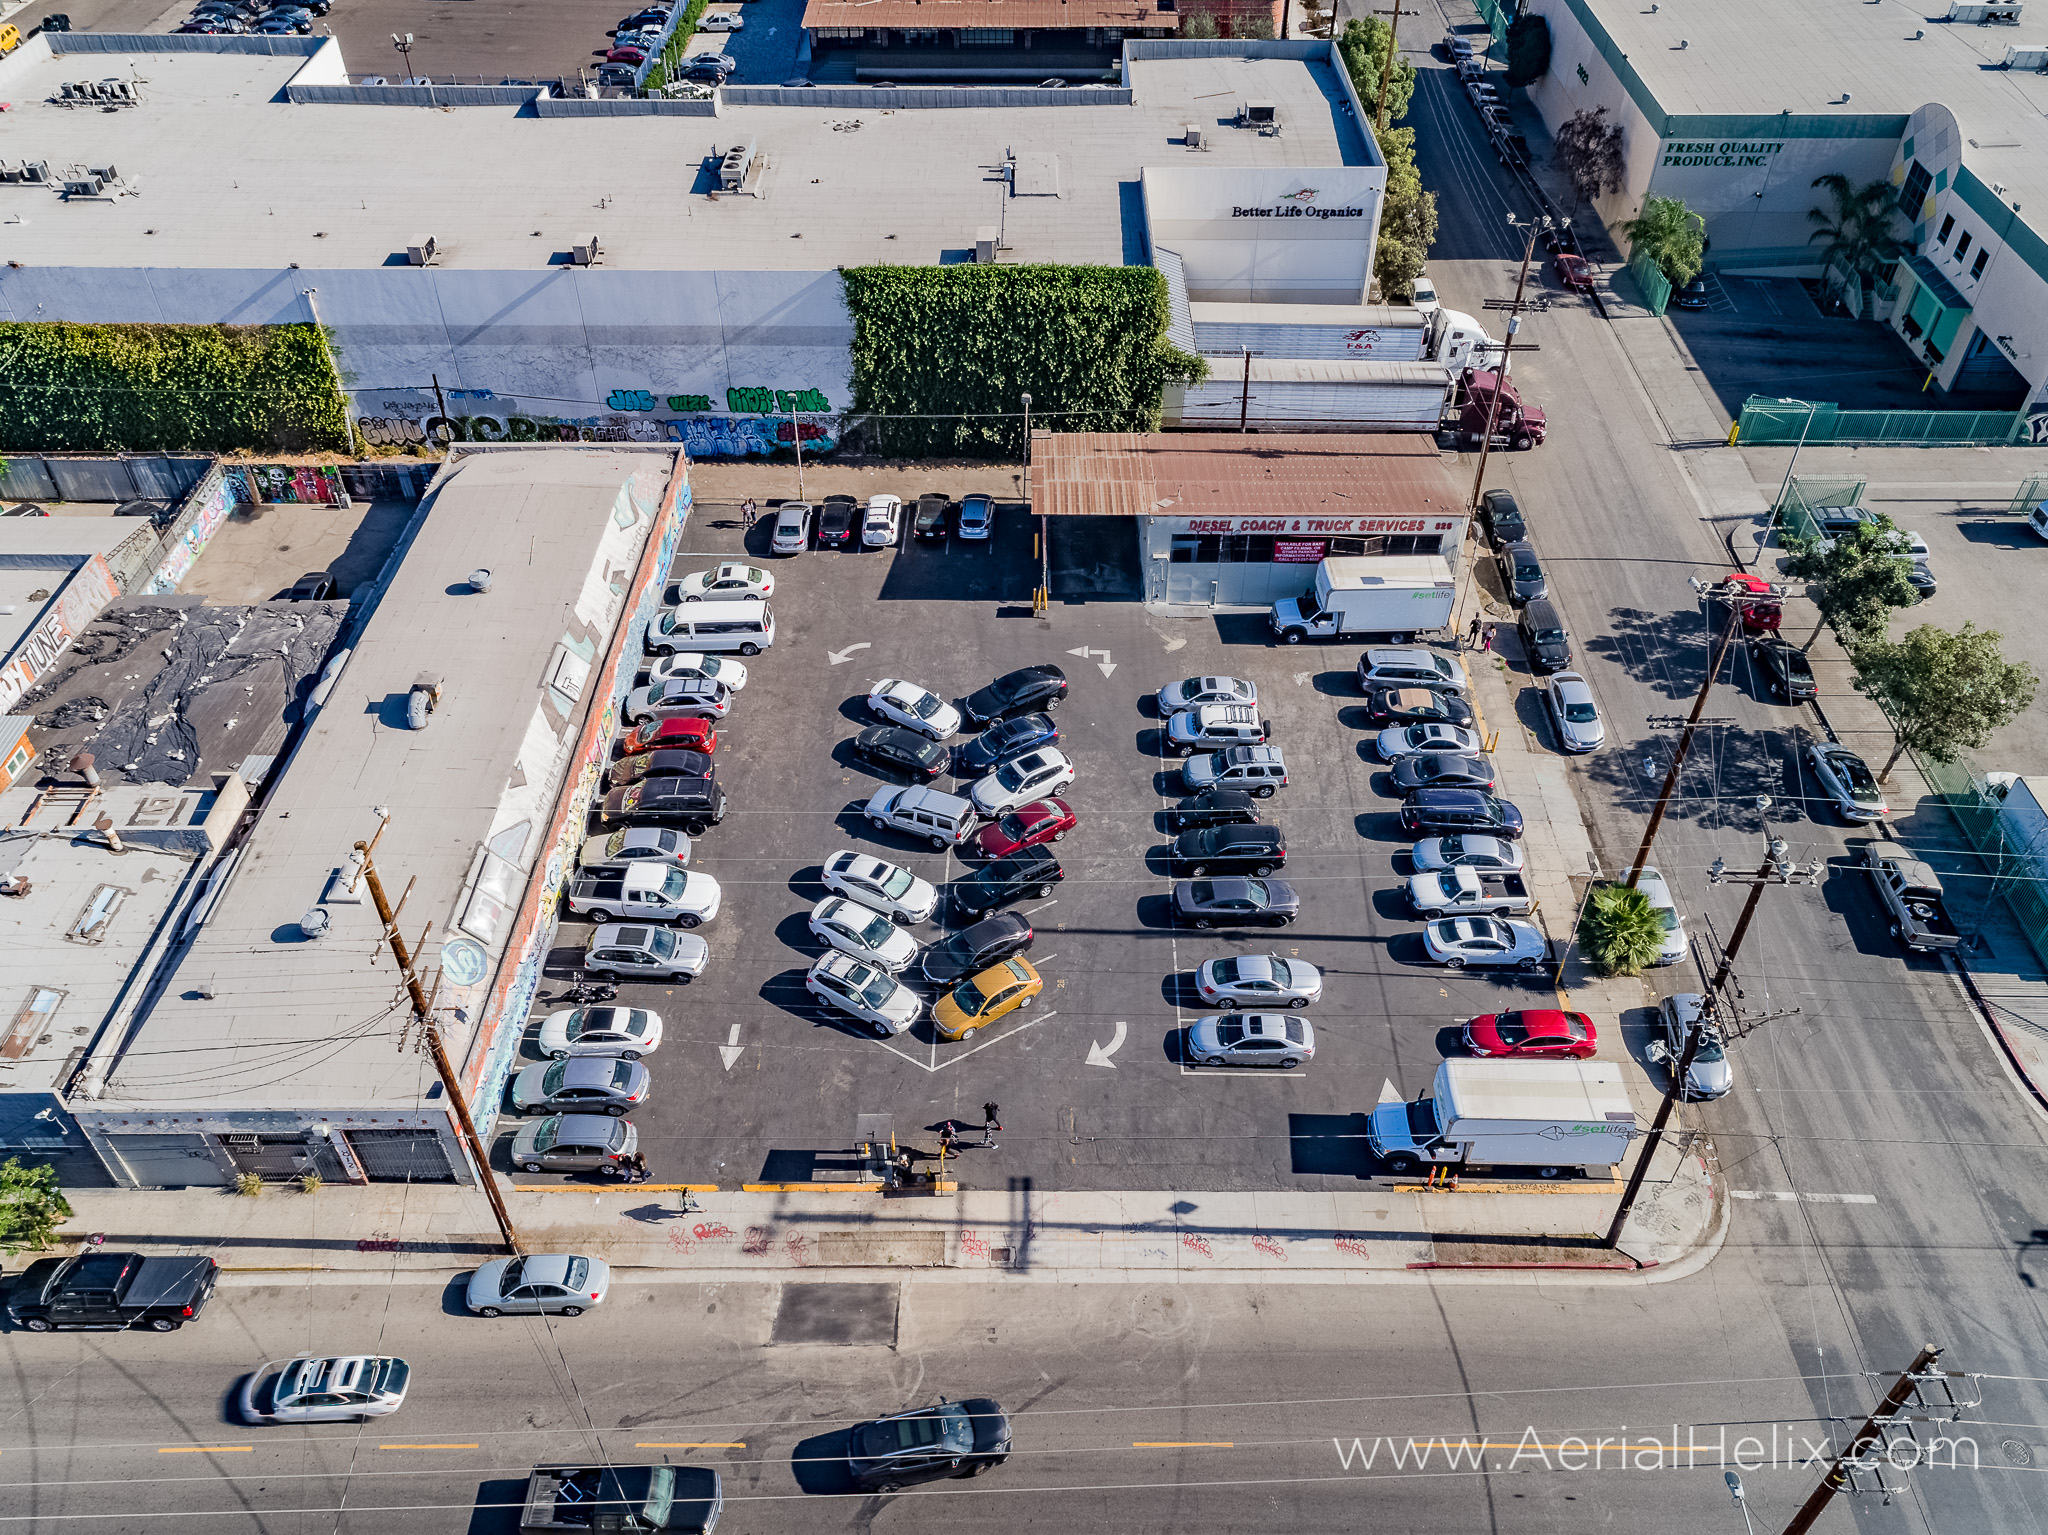 Perfect Parking 2 aerial photographer-24.jpg